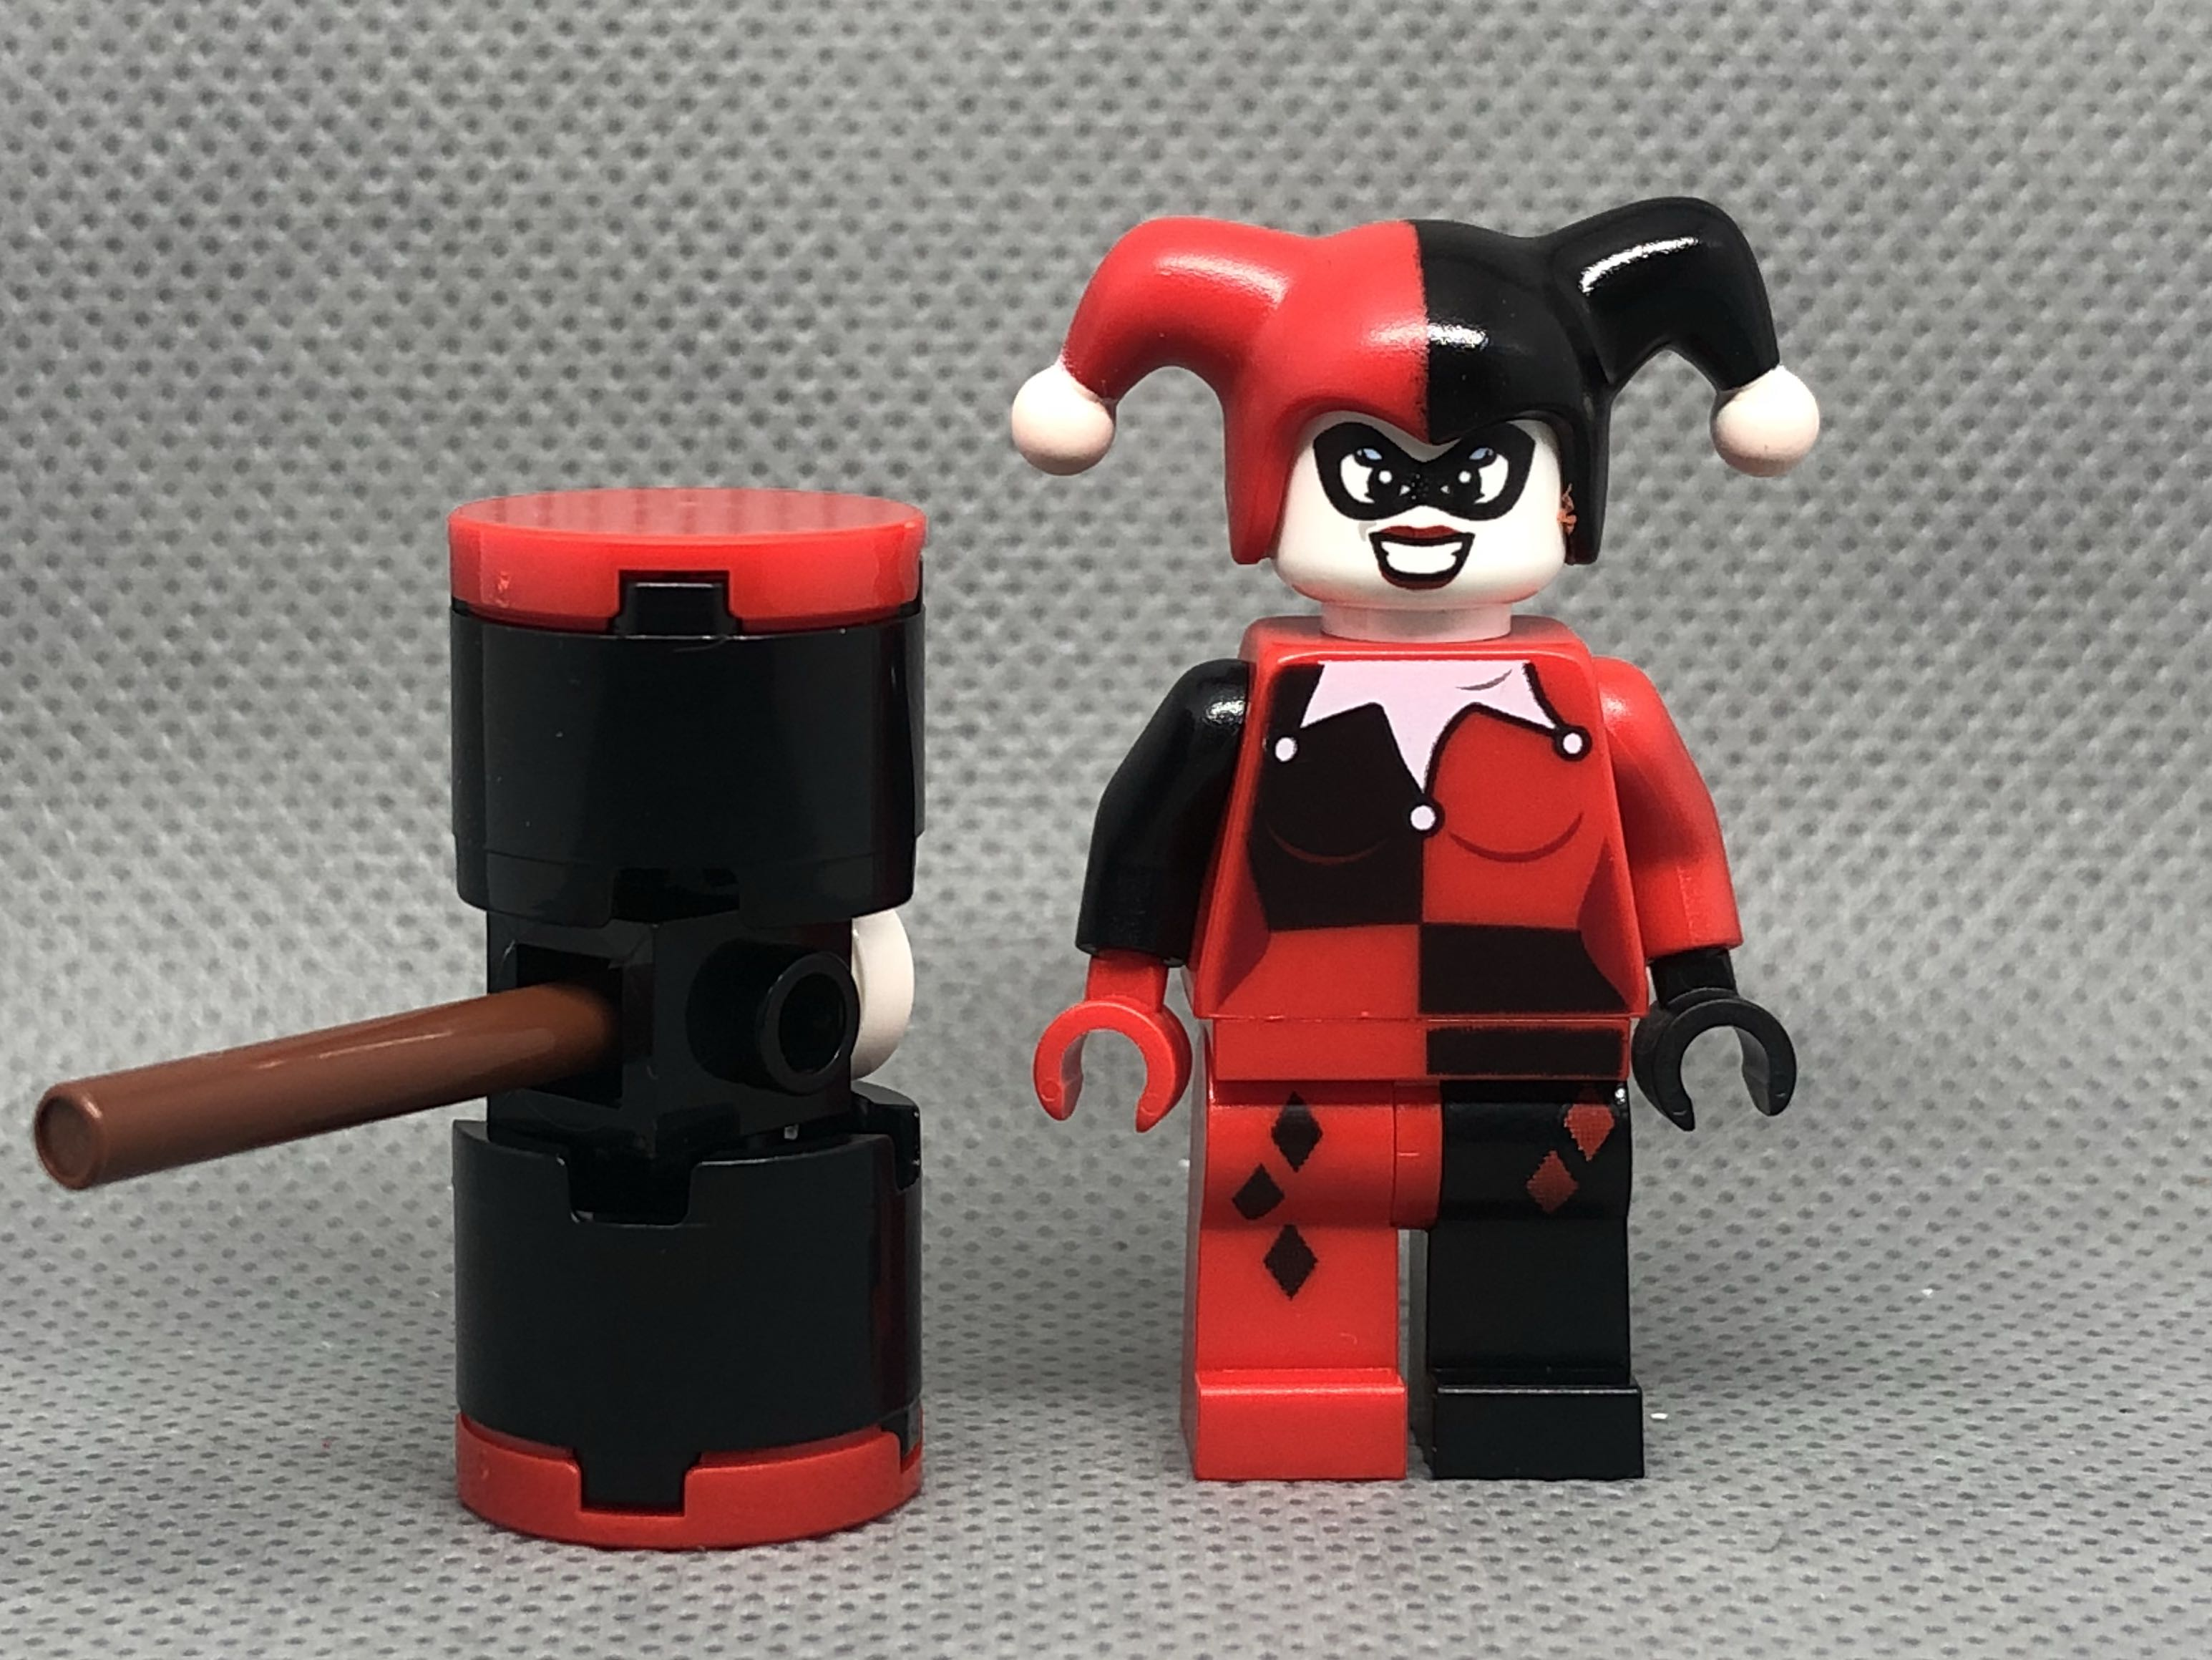 Genuine Minifig frm Set 6857 Harley Quinn LEGO Minifigure